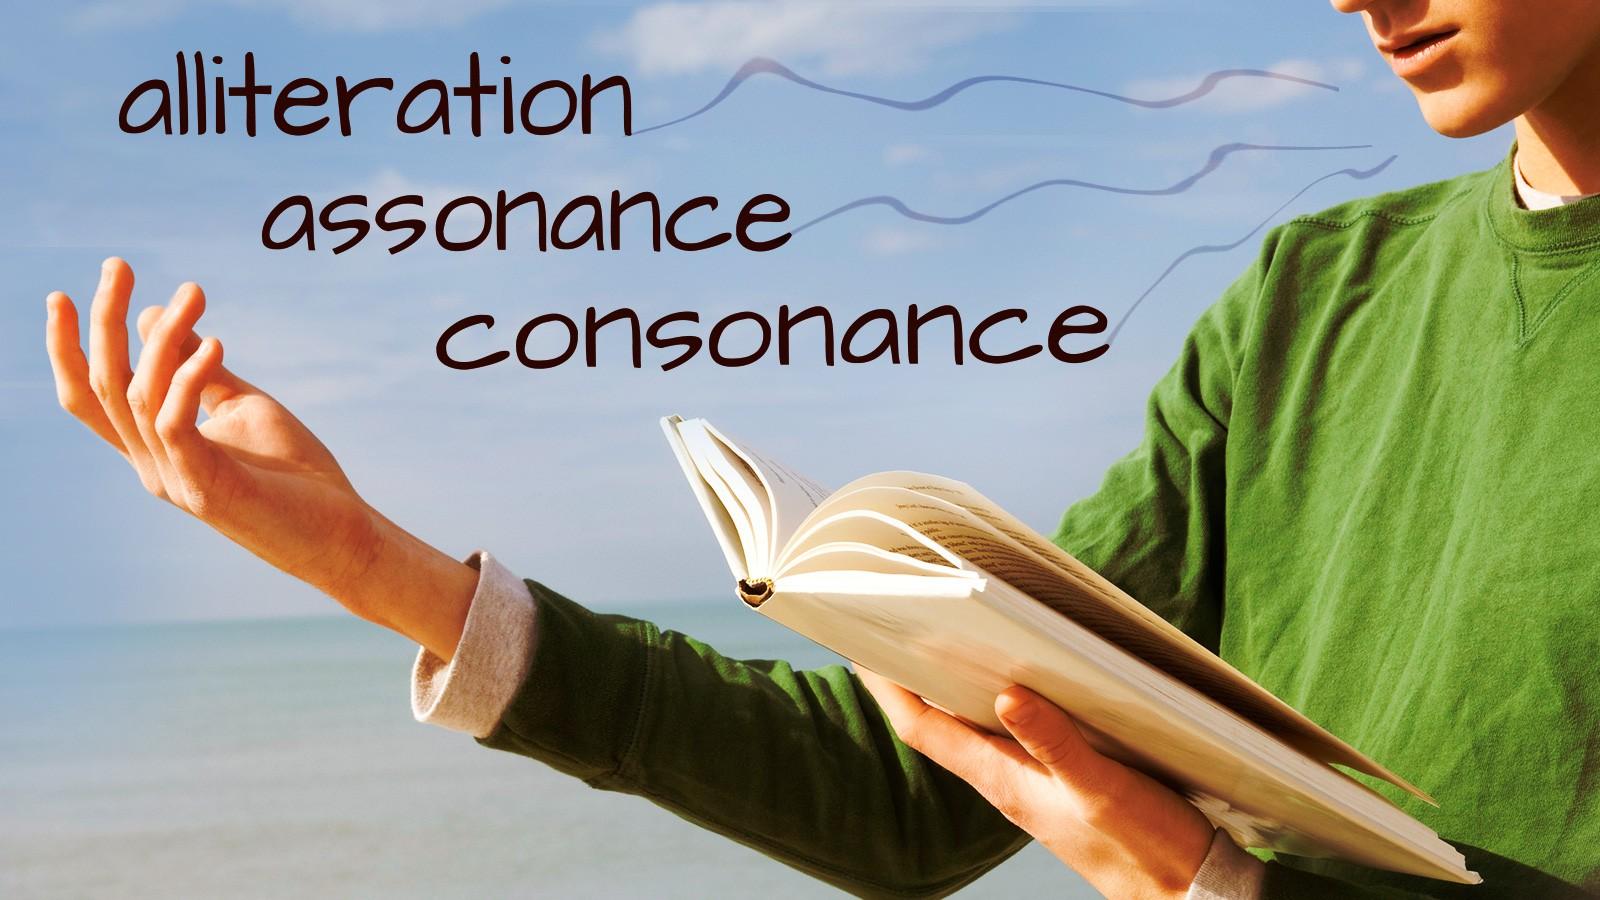 alliteration assonance consonance in poetry